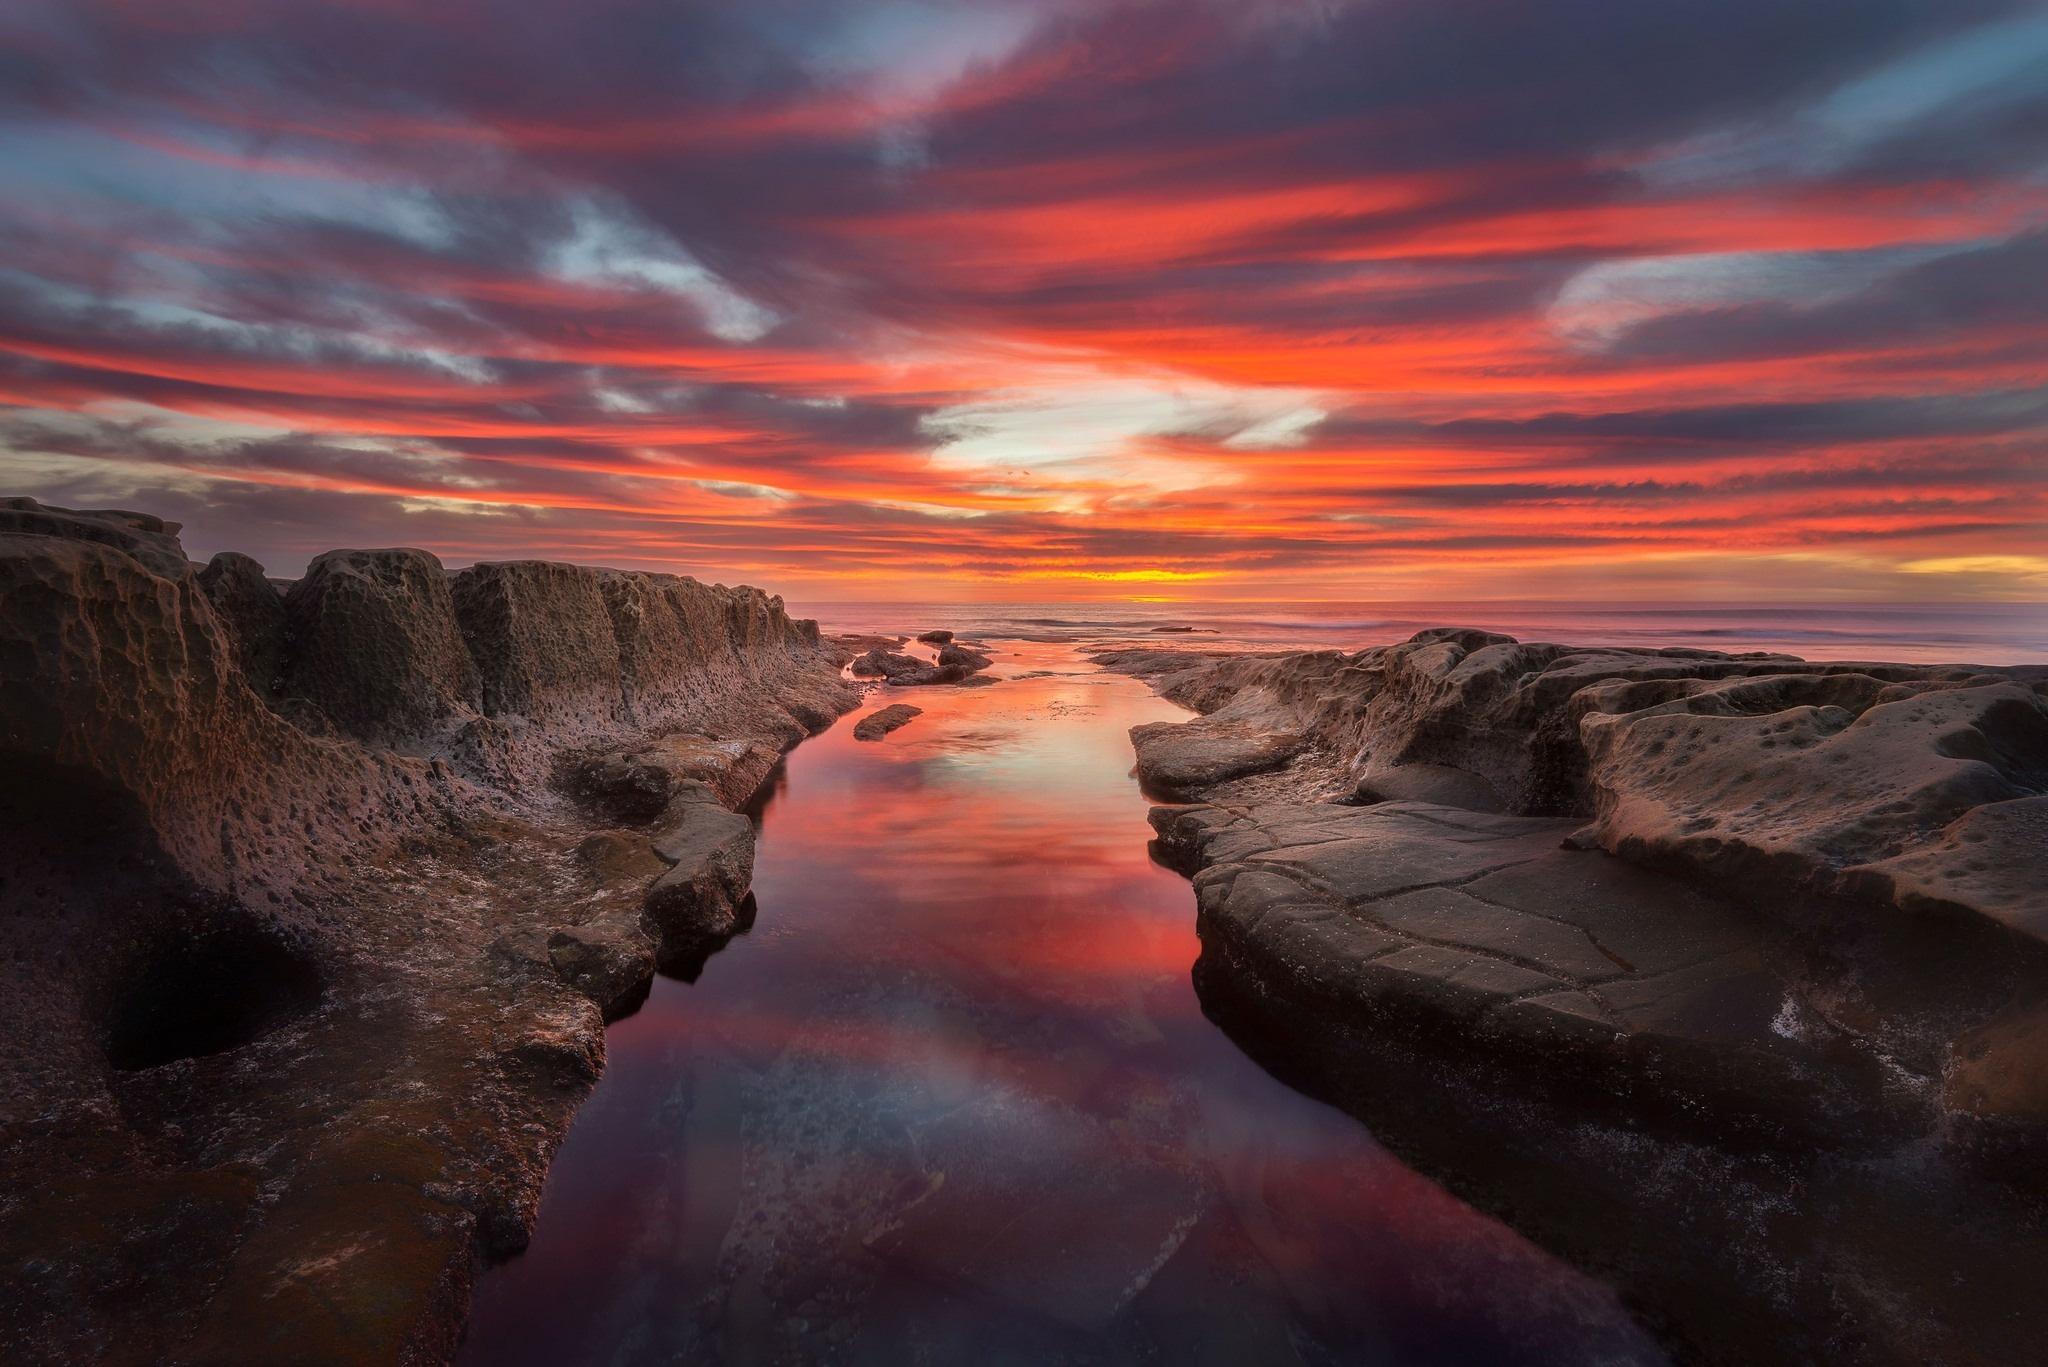 Картинка: Закат, небо, горы, вода